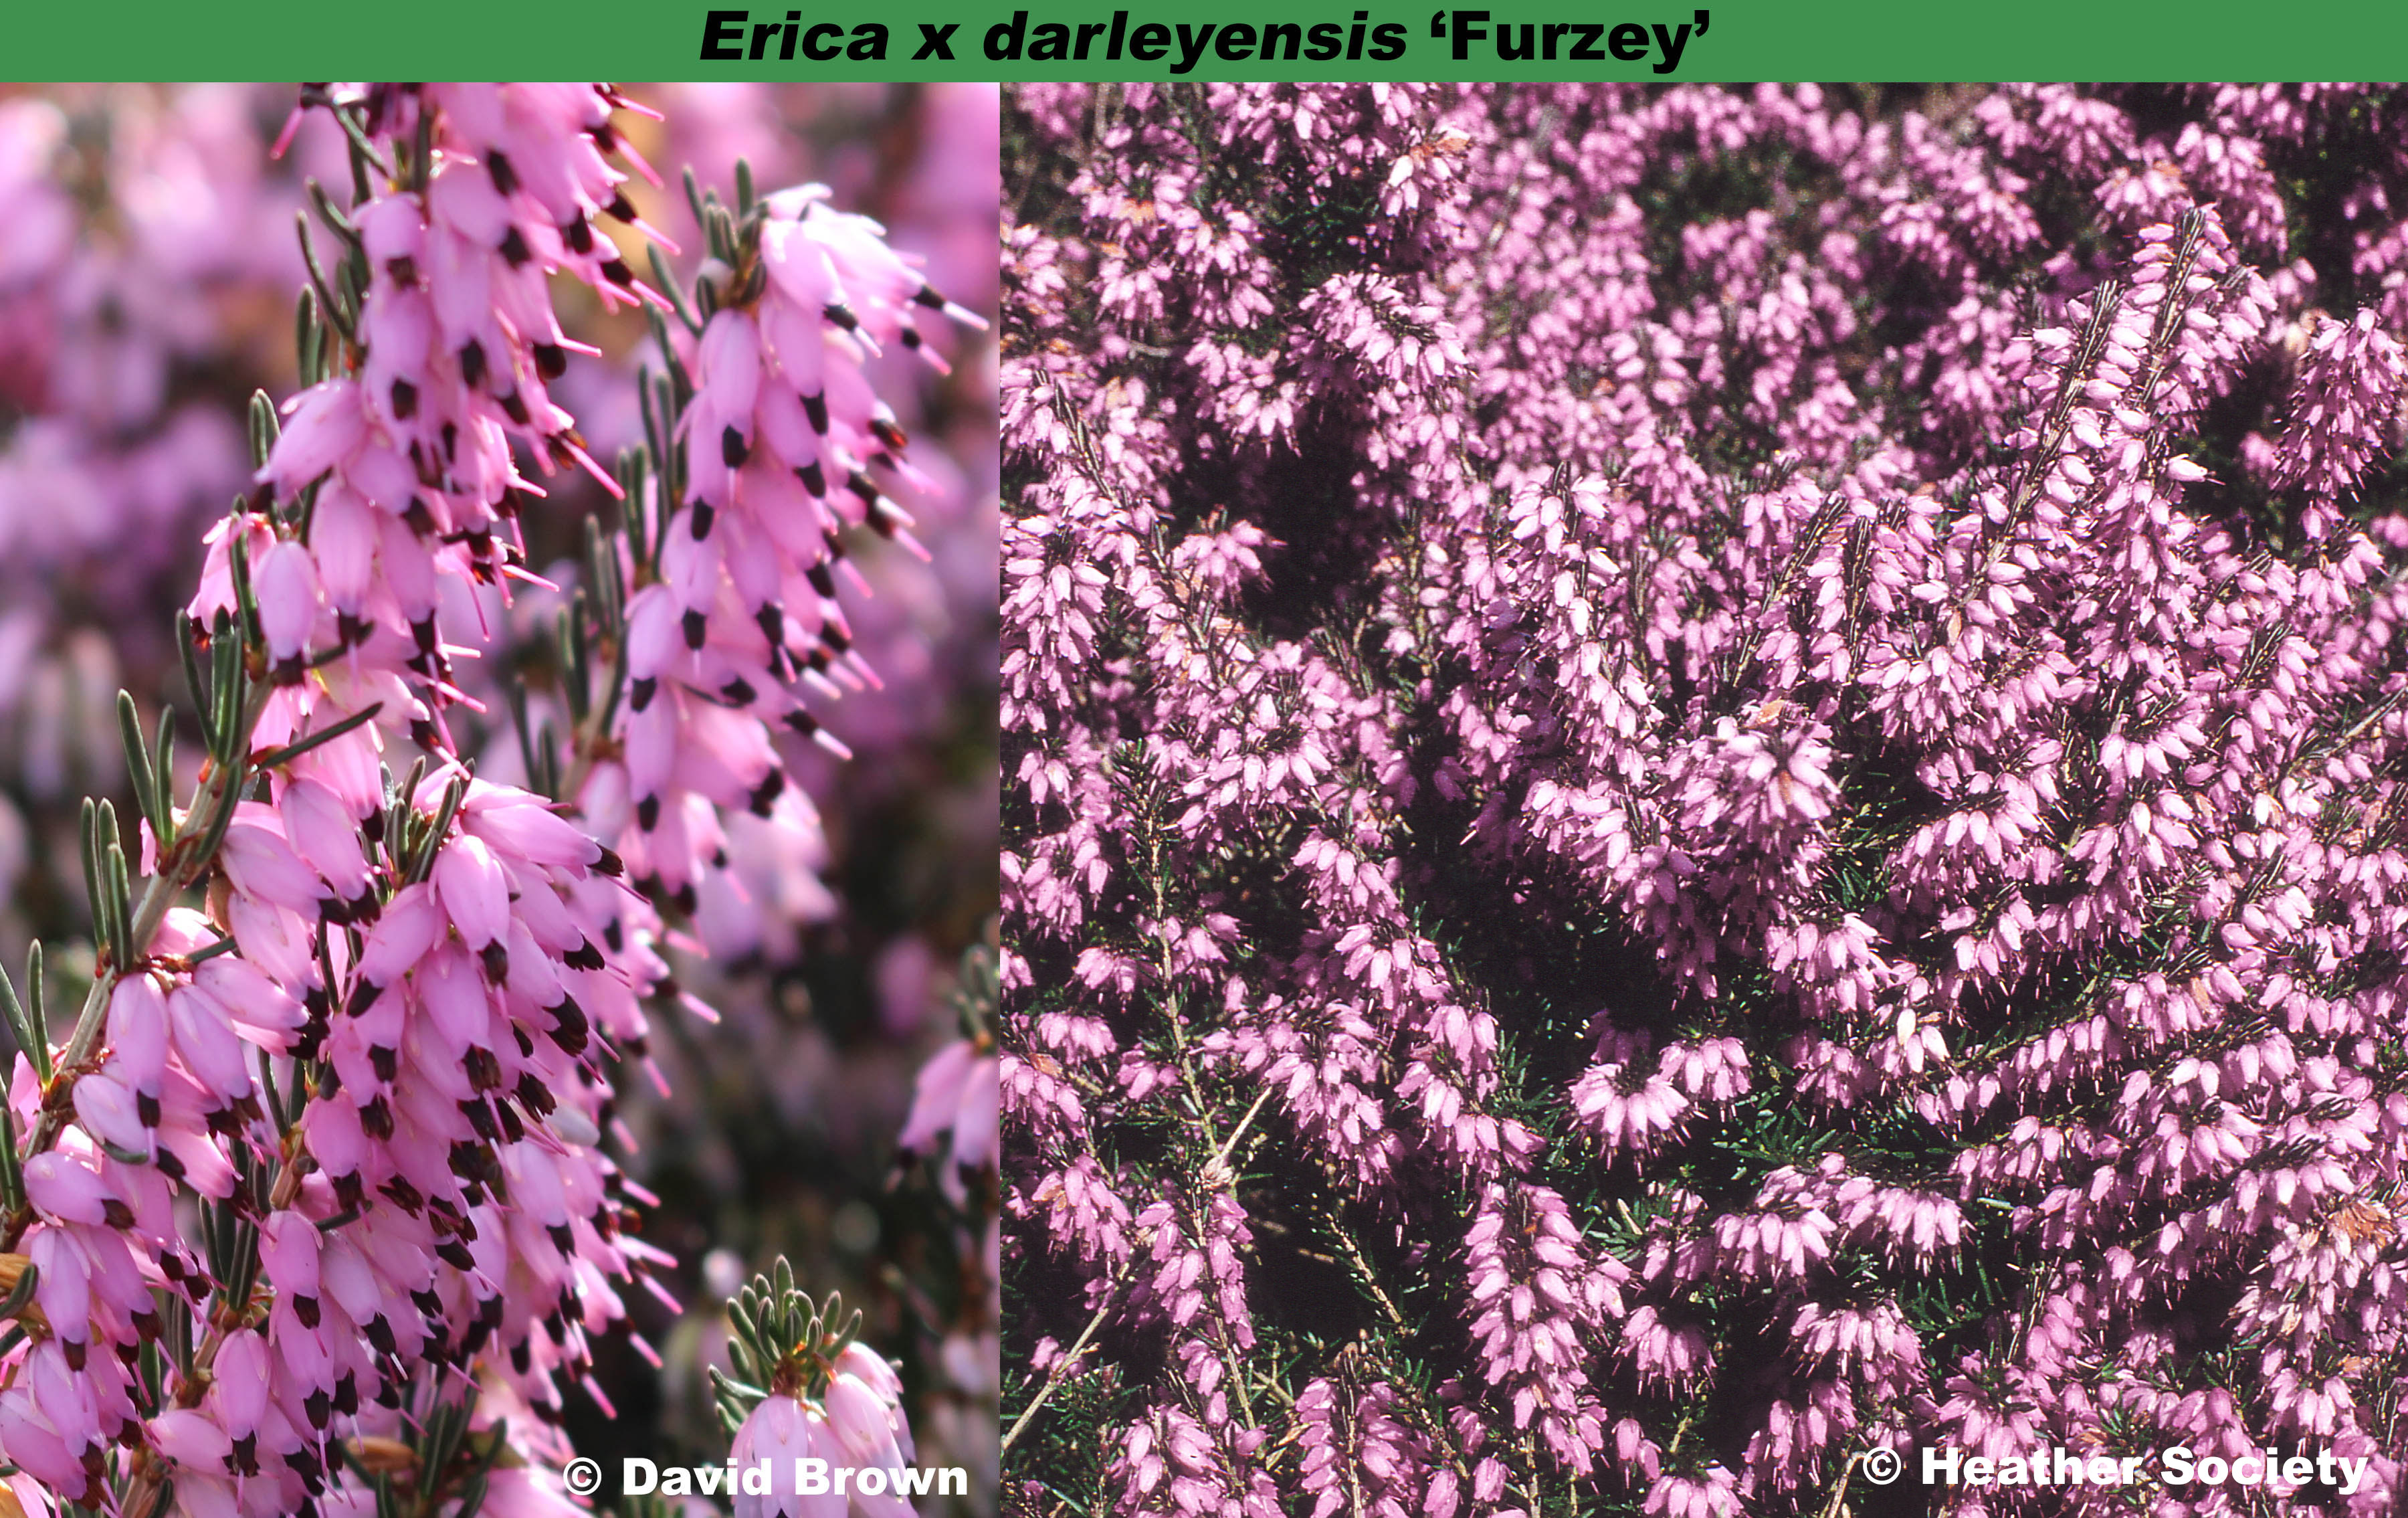 Erica x darleyensis 'Furzey'